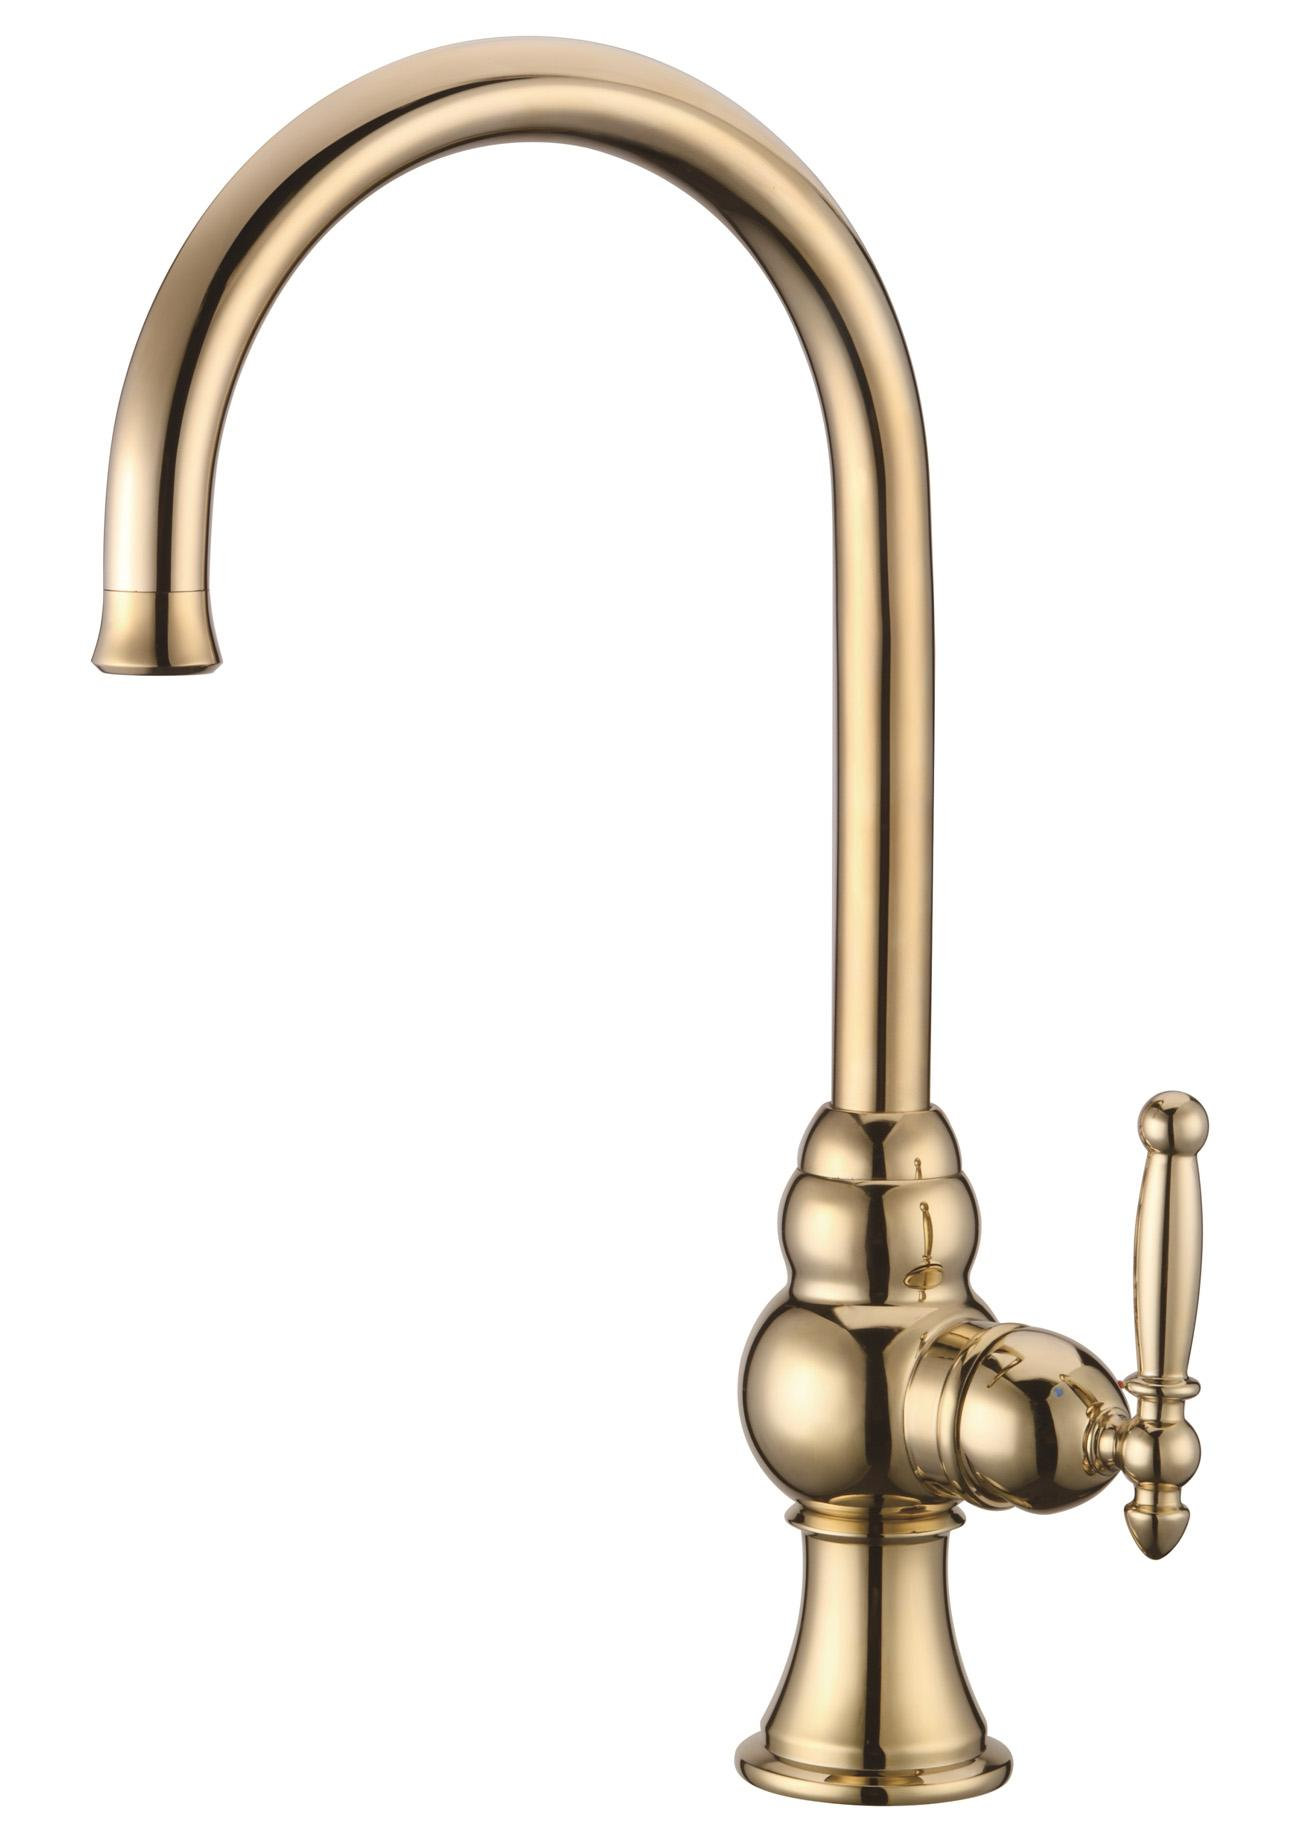 Online Cheap Cloud Power Antique Faucets Taps With Brass Ceramic Valve Core Bathroom Sink